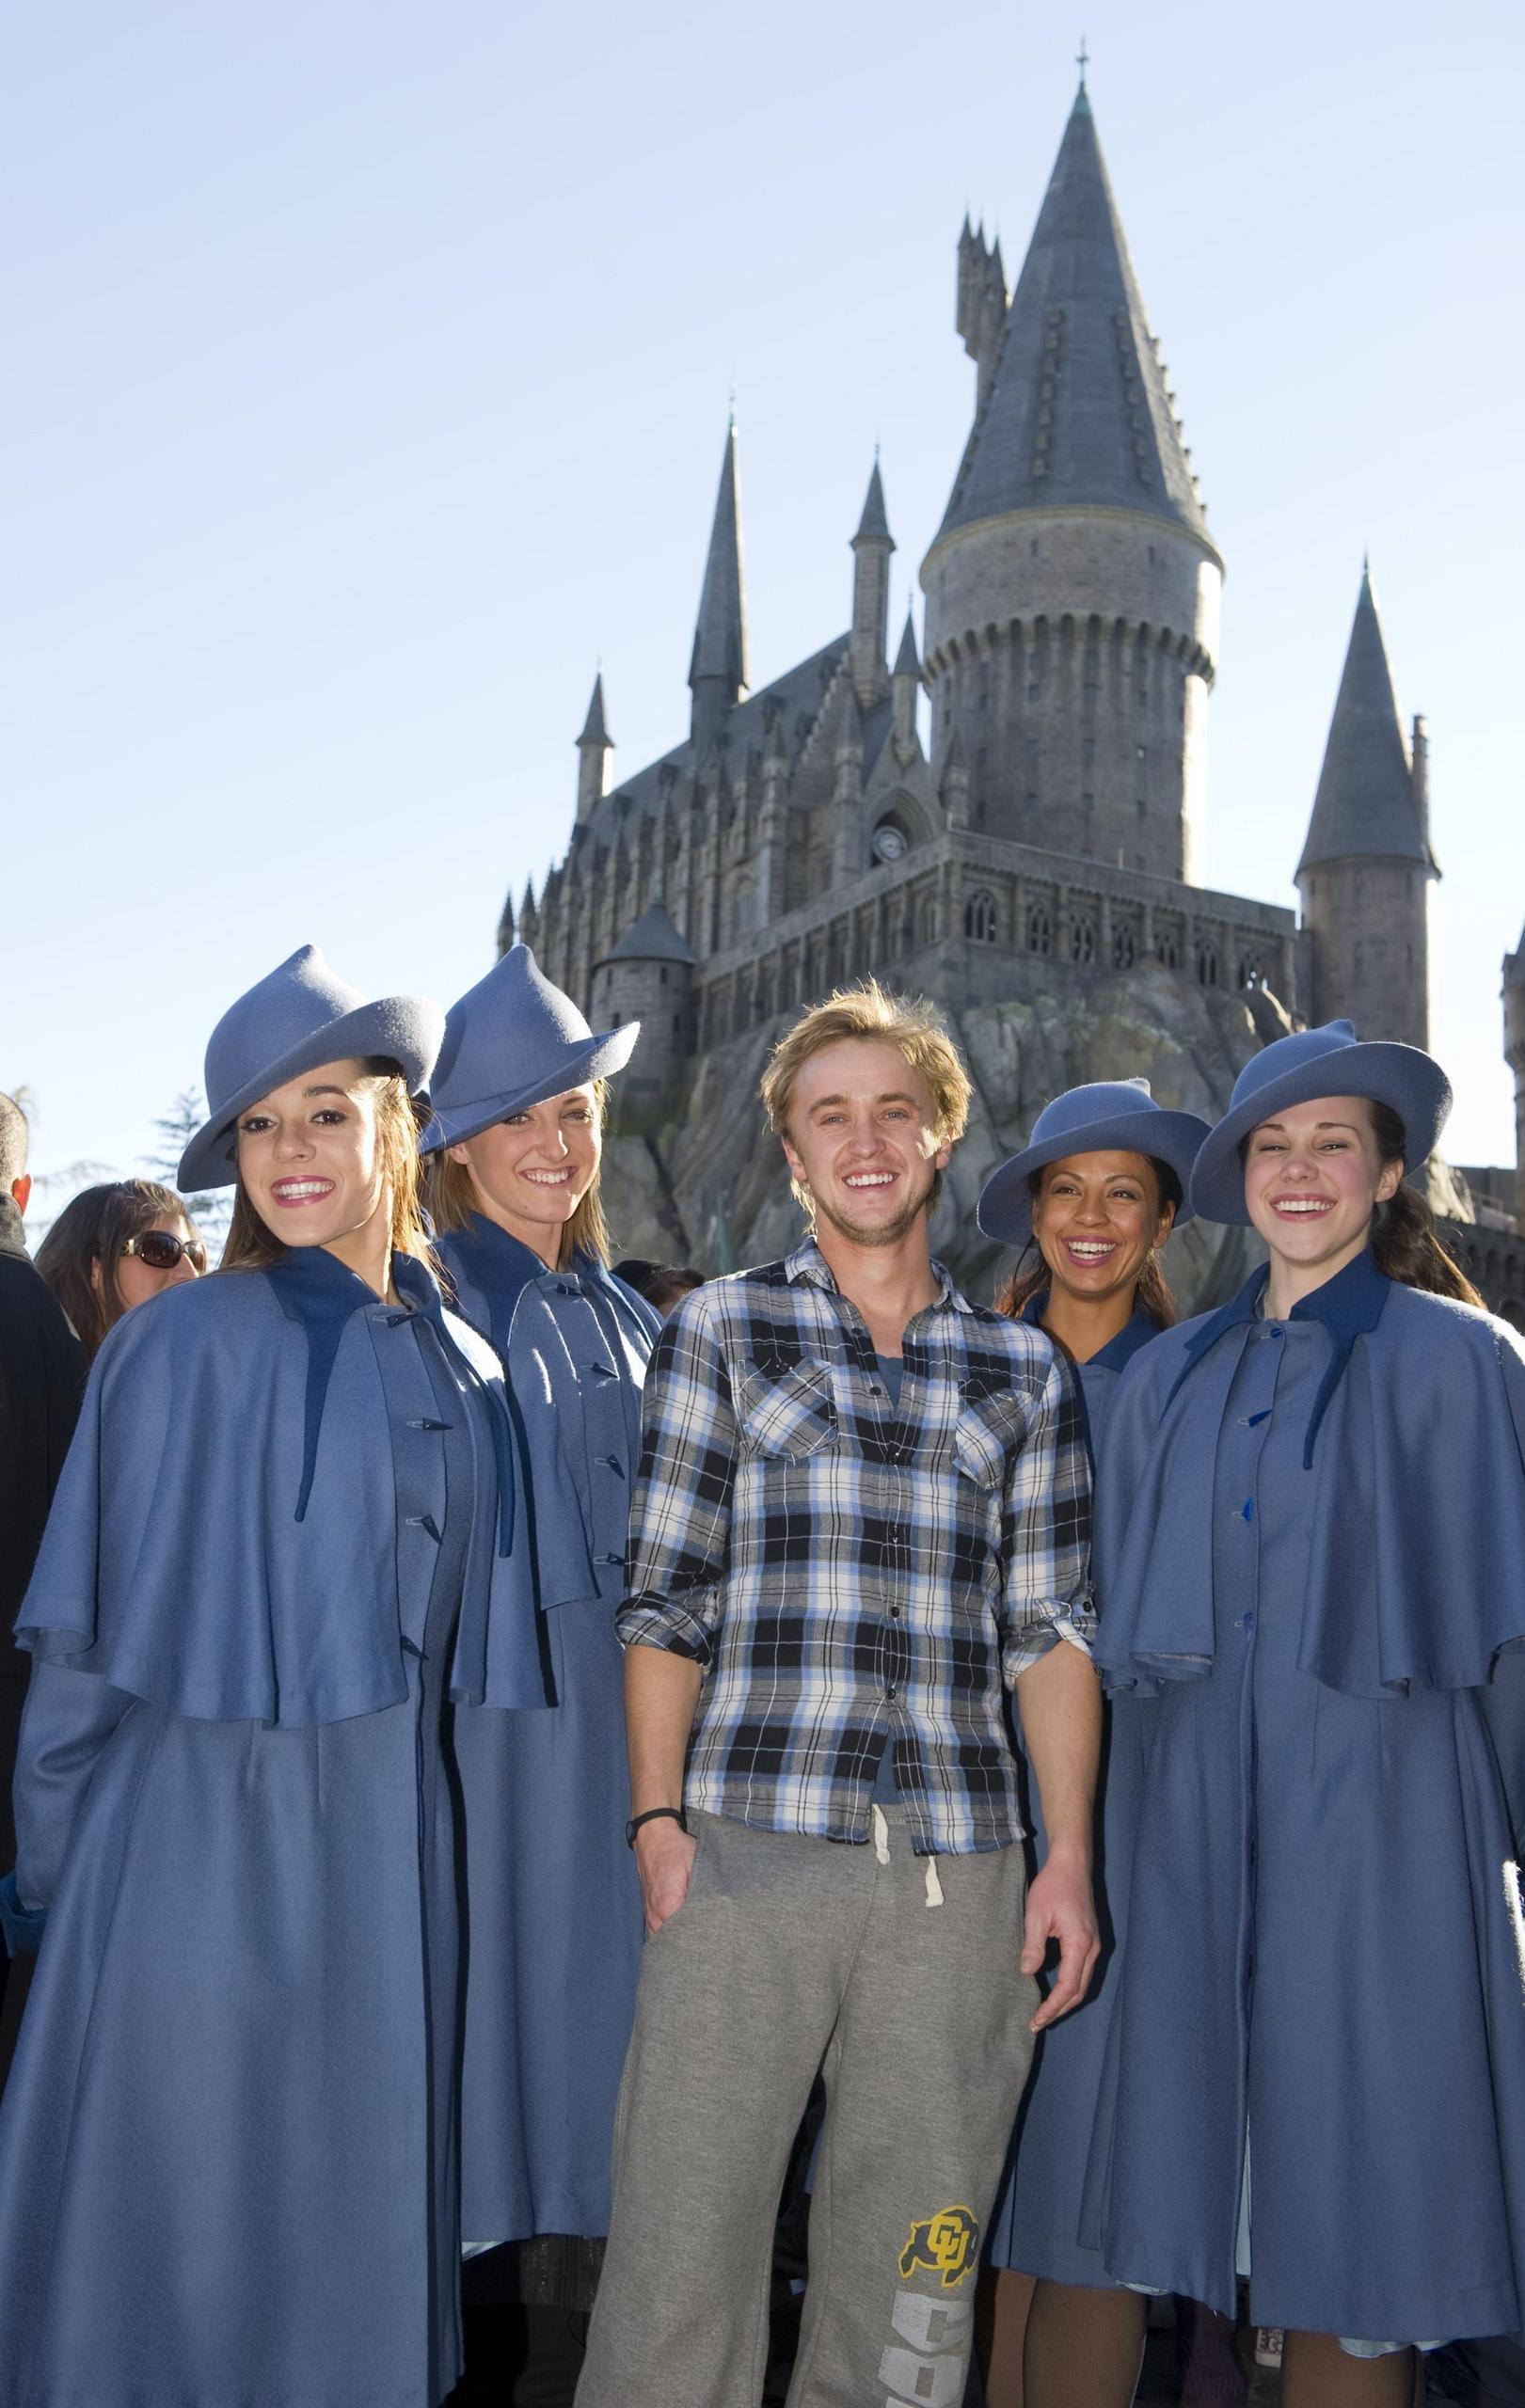 http://images4.fanpop.com/image/photos/18000000/Tom-visits-Wizarding-World-of-Harry-Potter-harry-potter-18010673-1621-2560.jpg